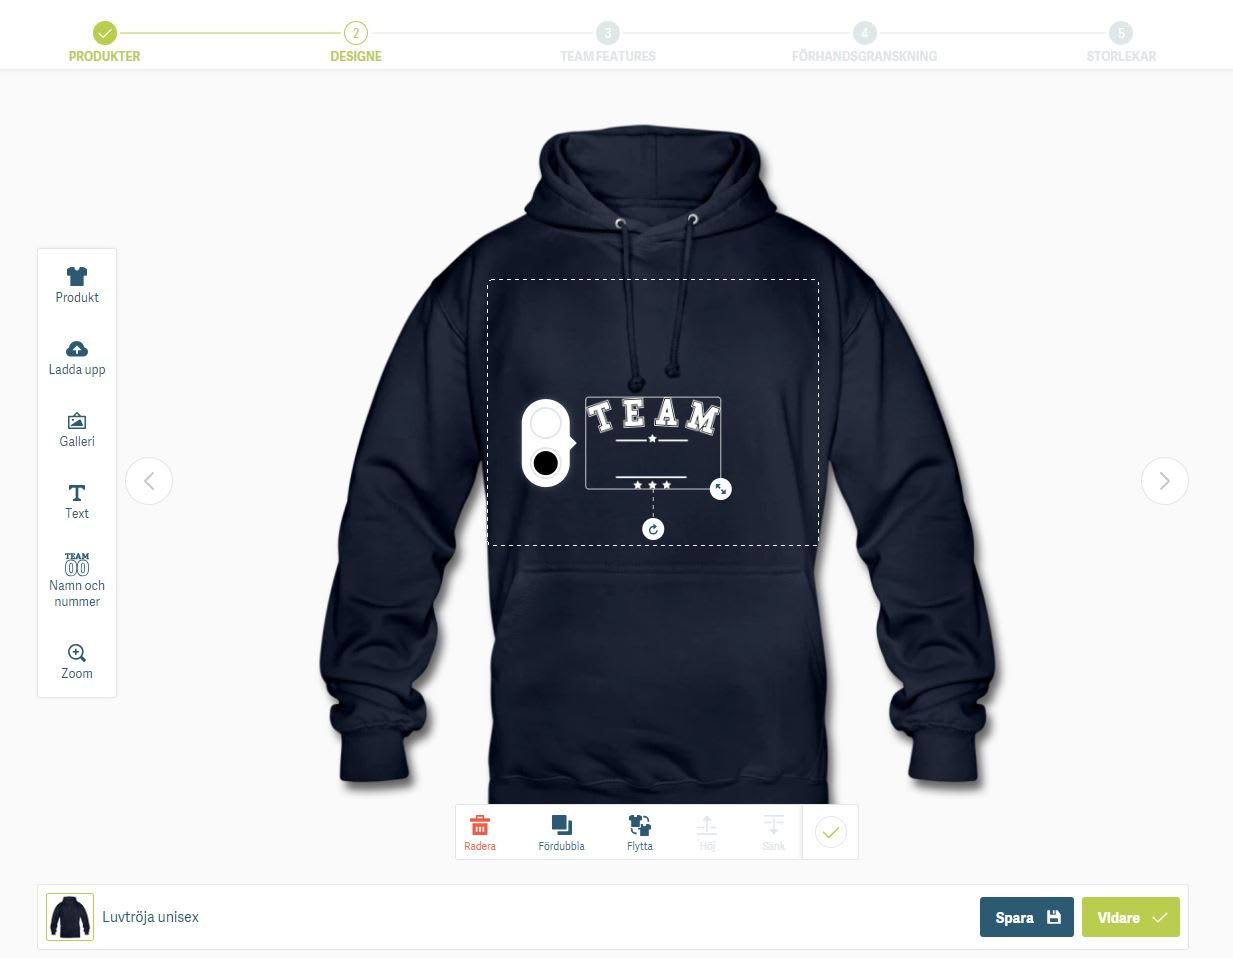 designa egen tröja